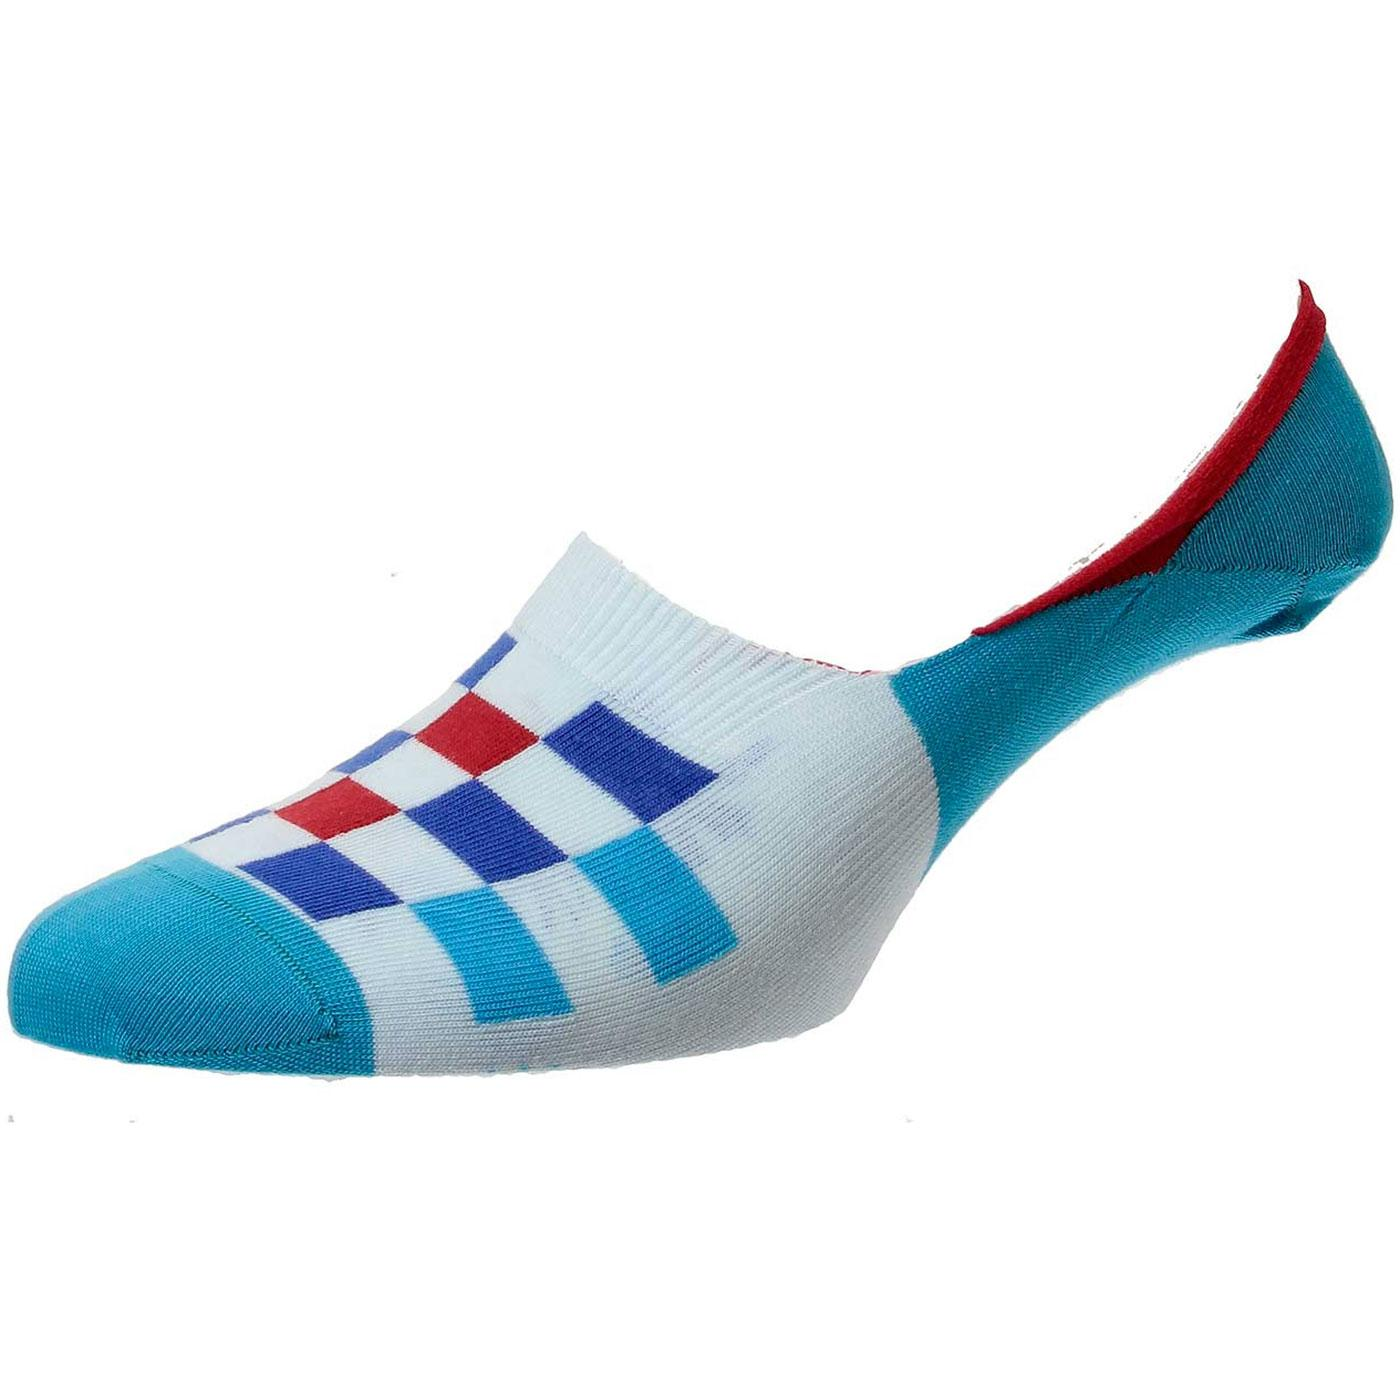 + Calero PANTHERELLA Chequerboard Invisible Socks